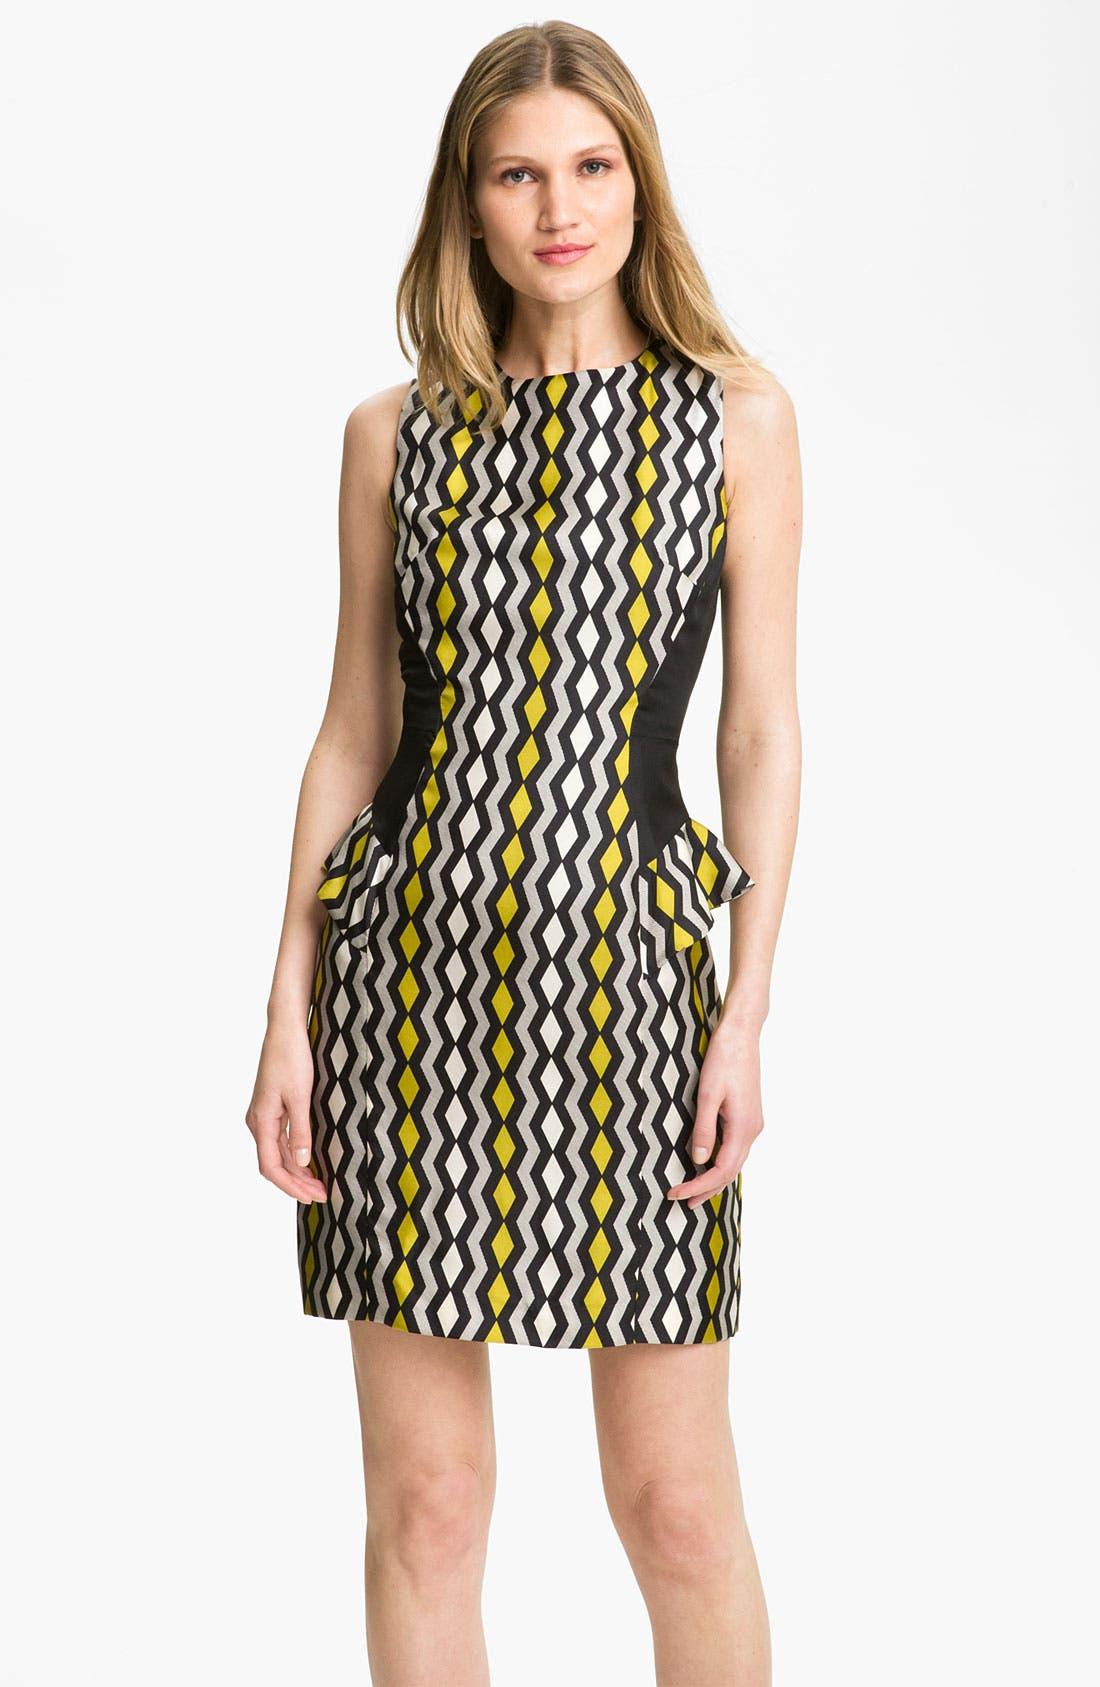 Alternate Image 1 Selected - Milly 'Viola' Geo Print Peplum Dress